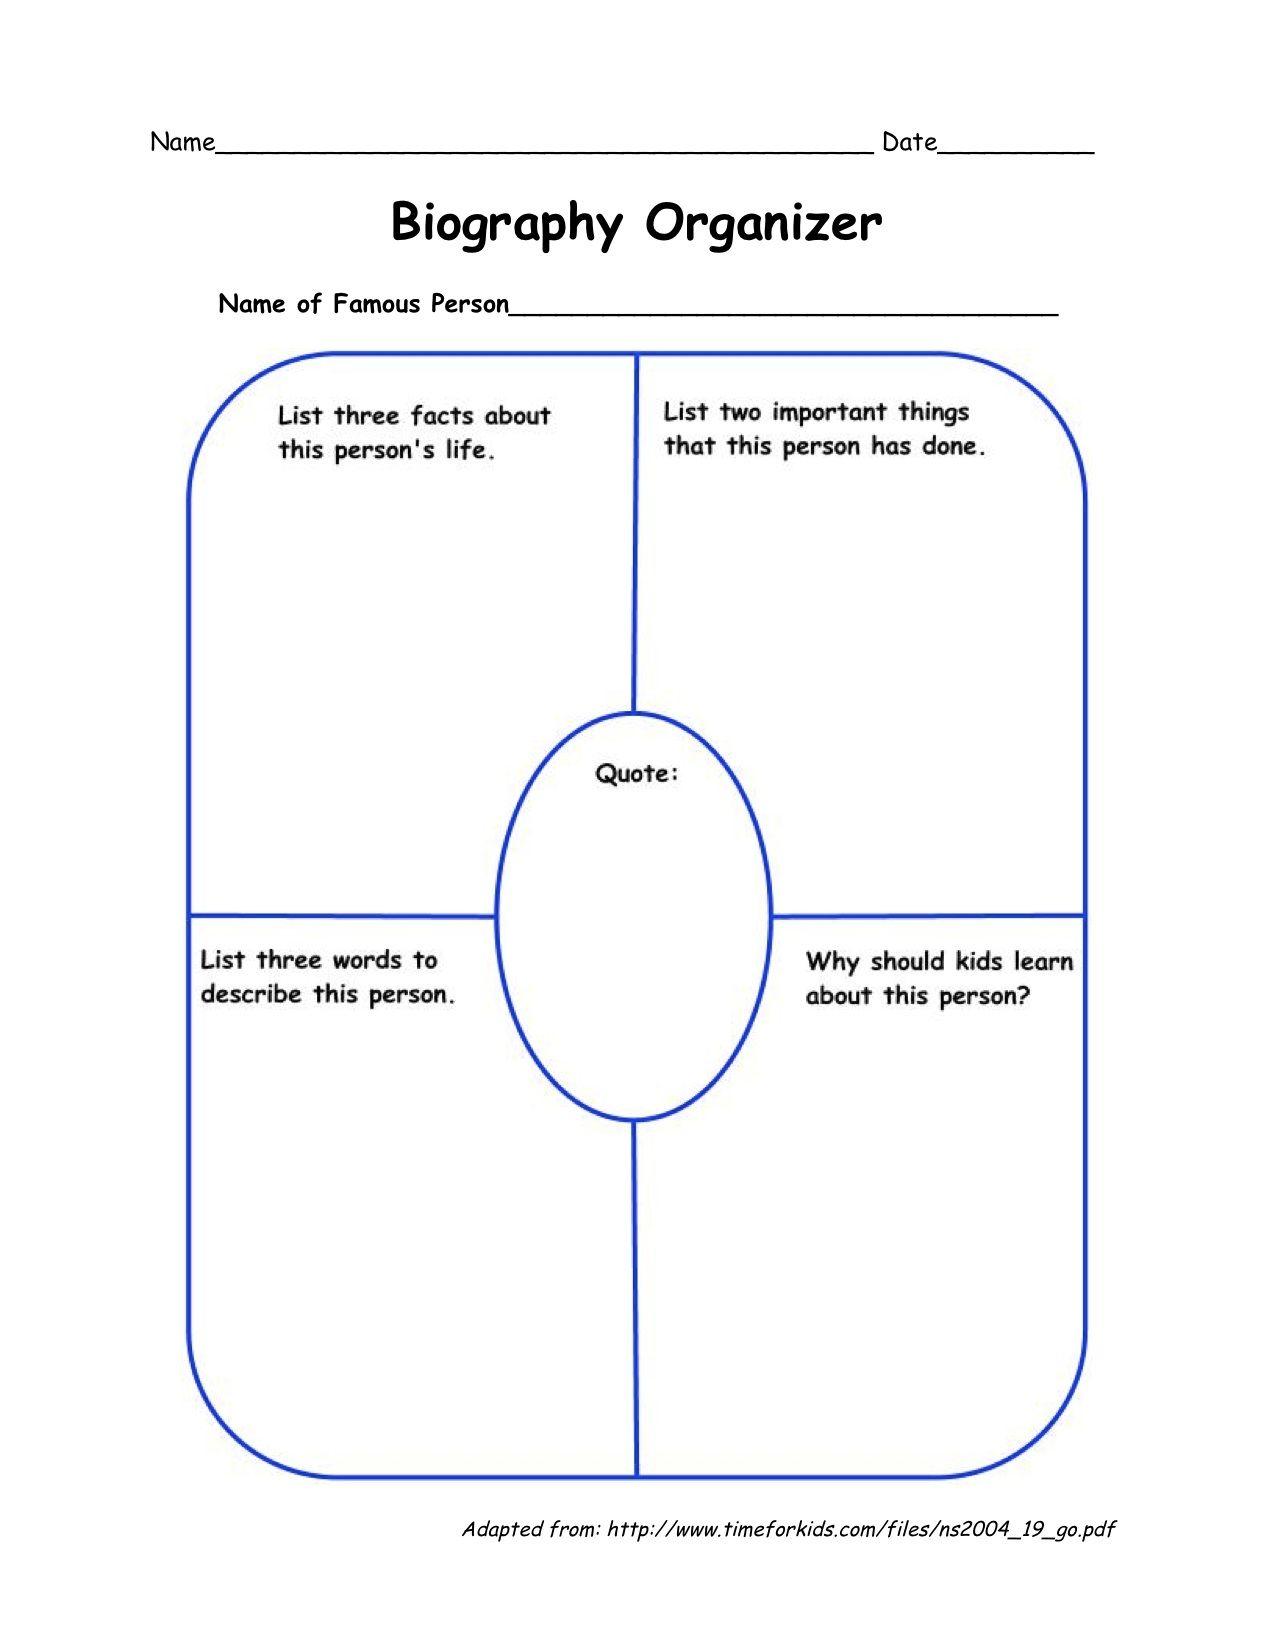 small resolution of templatebiographyorganizer-1.jpg (1275×1651)   Second grade writing